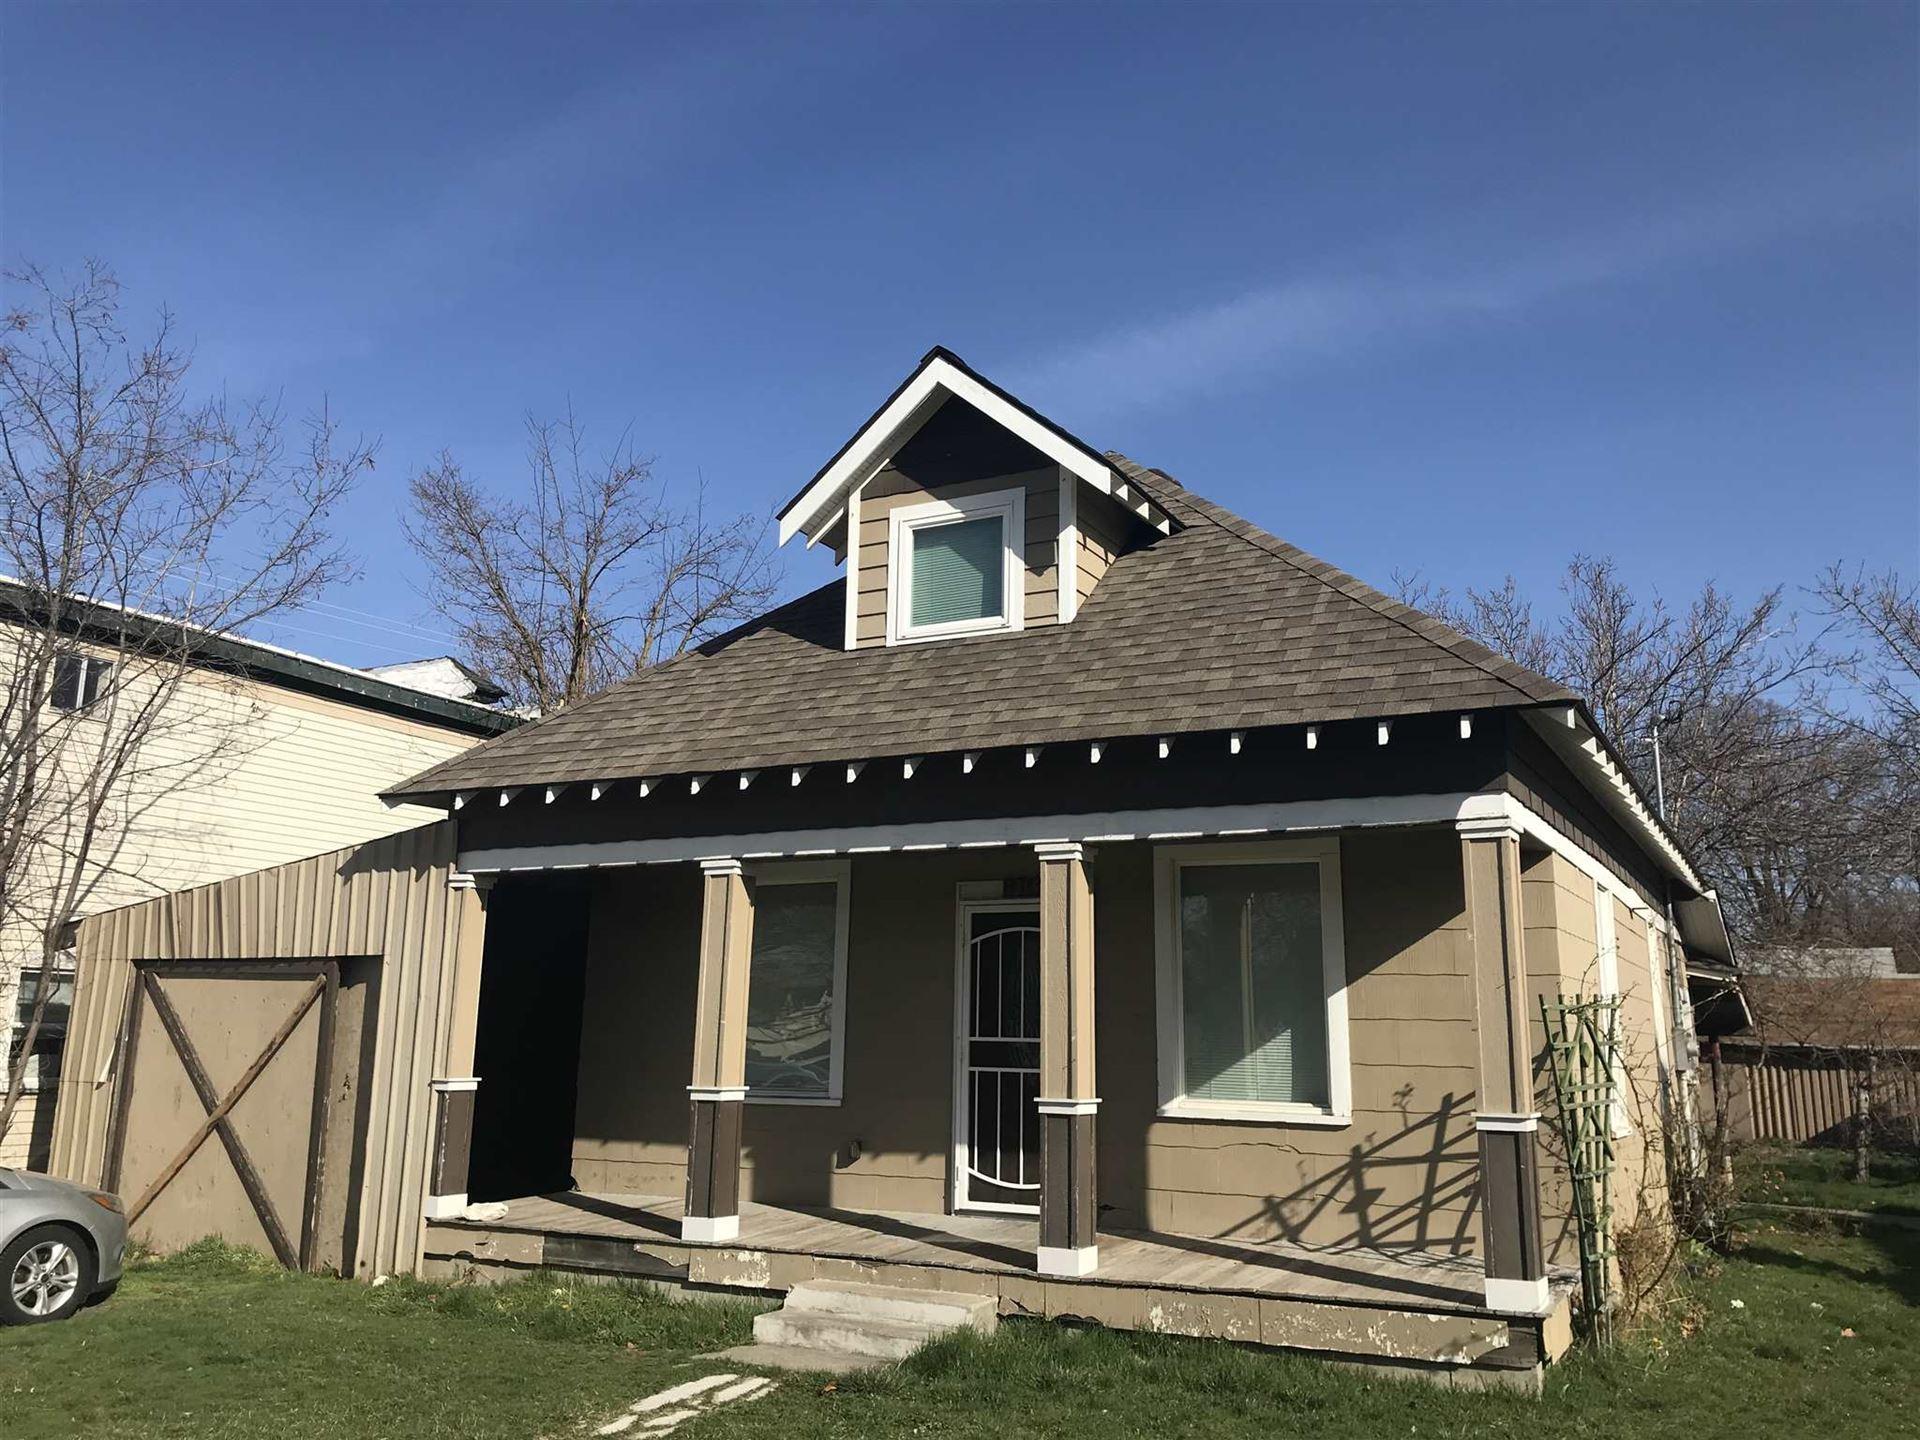 1314 W Cleveland Ave, Spokane, WA 99205 - #: 202113279